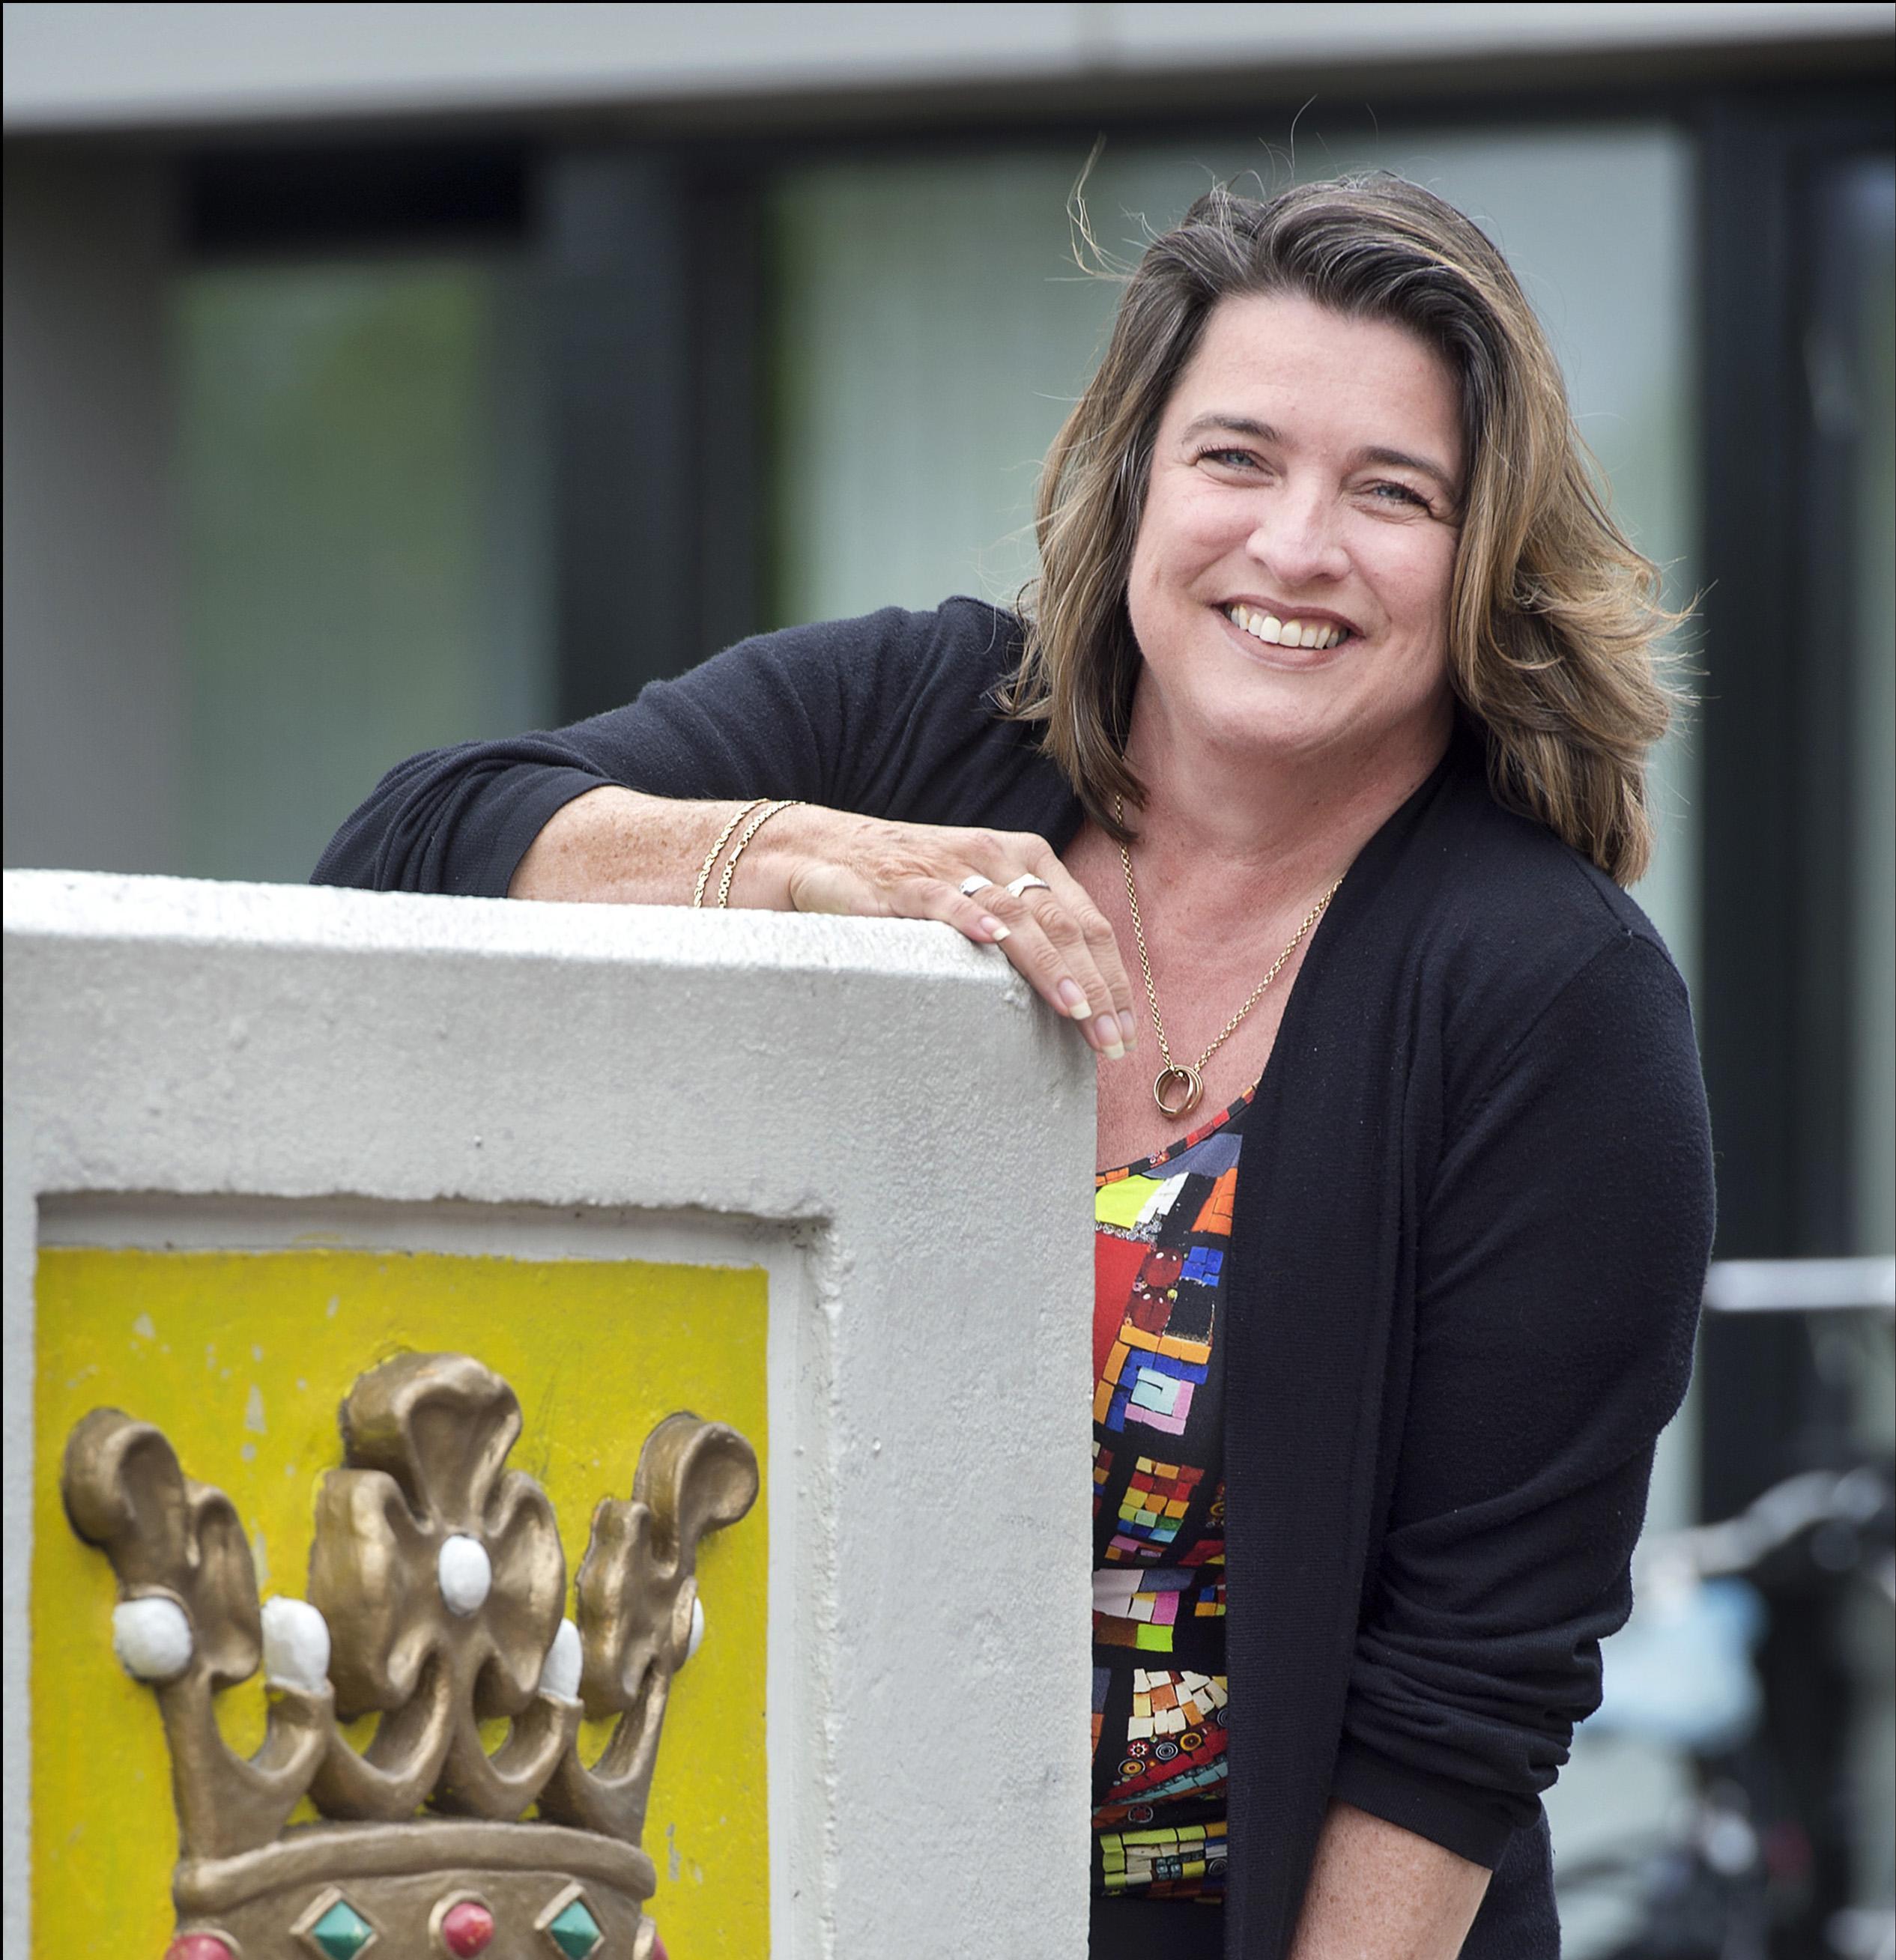 Marjolein Steffens weer lijsttrekker HAP in Haarlemmermeer